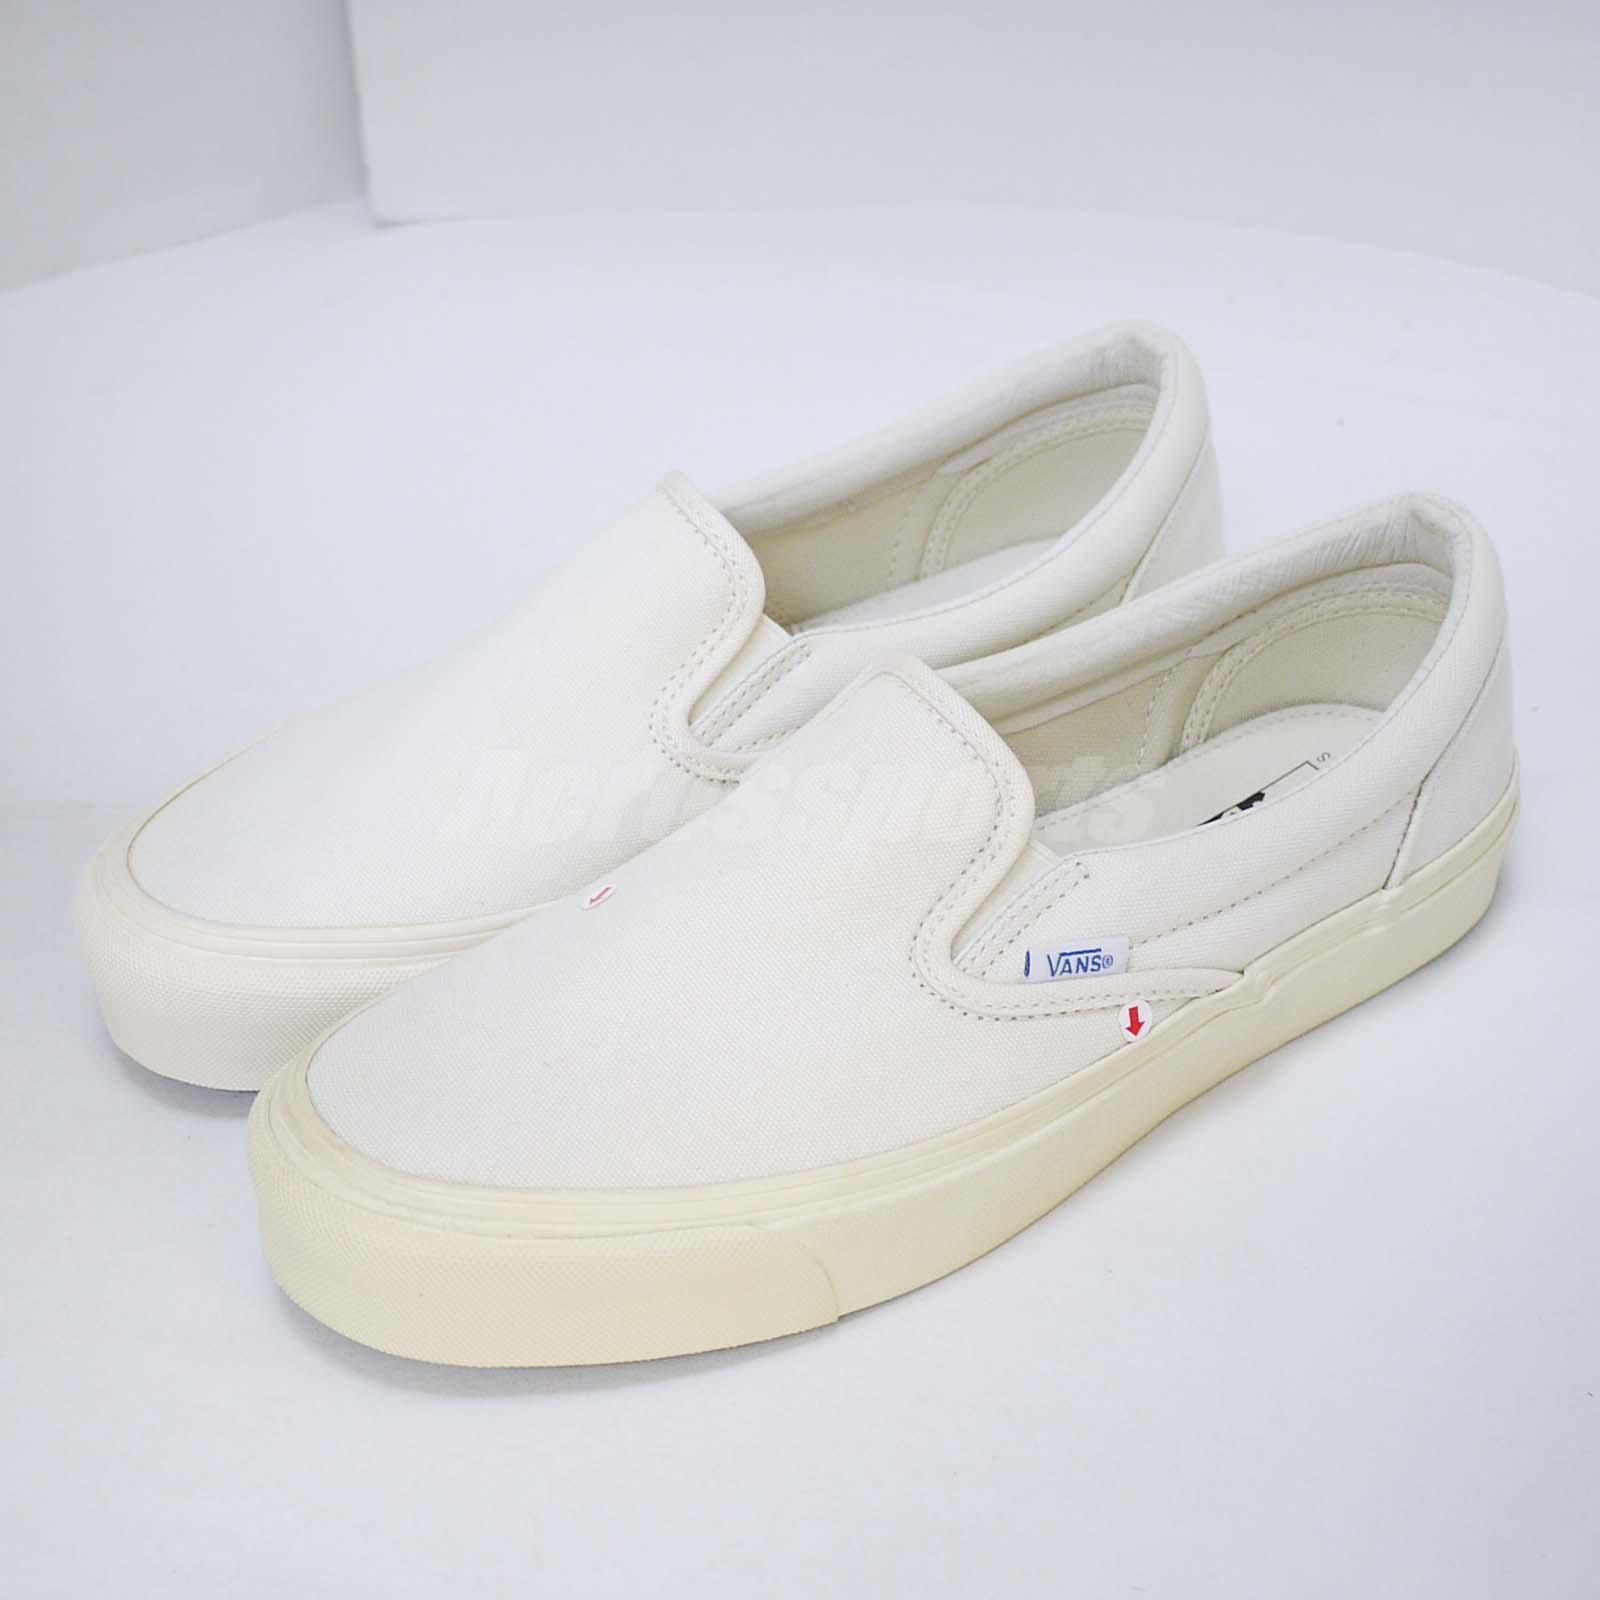 Vans OG Classic Slip-On Vault Left Foot With Discoloration Men shoes 71070804